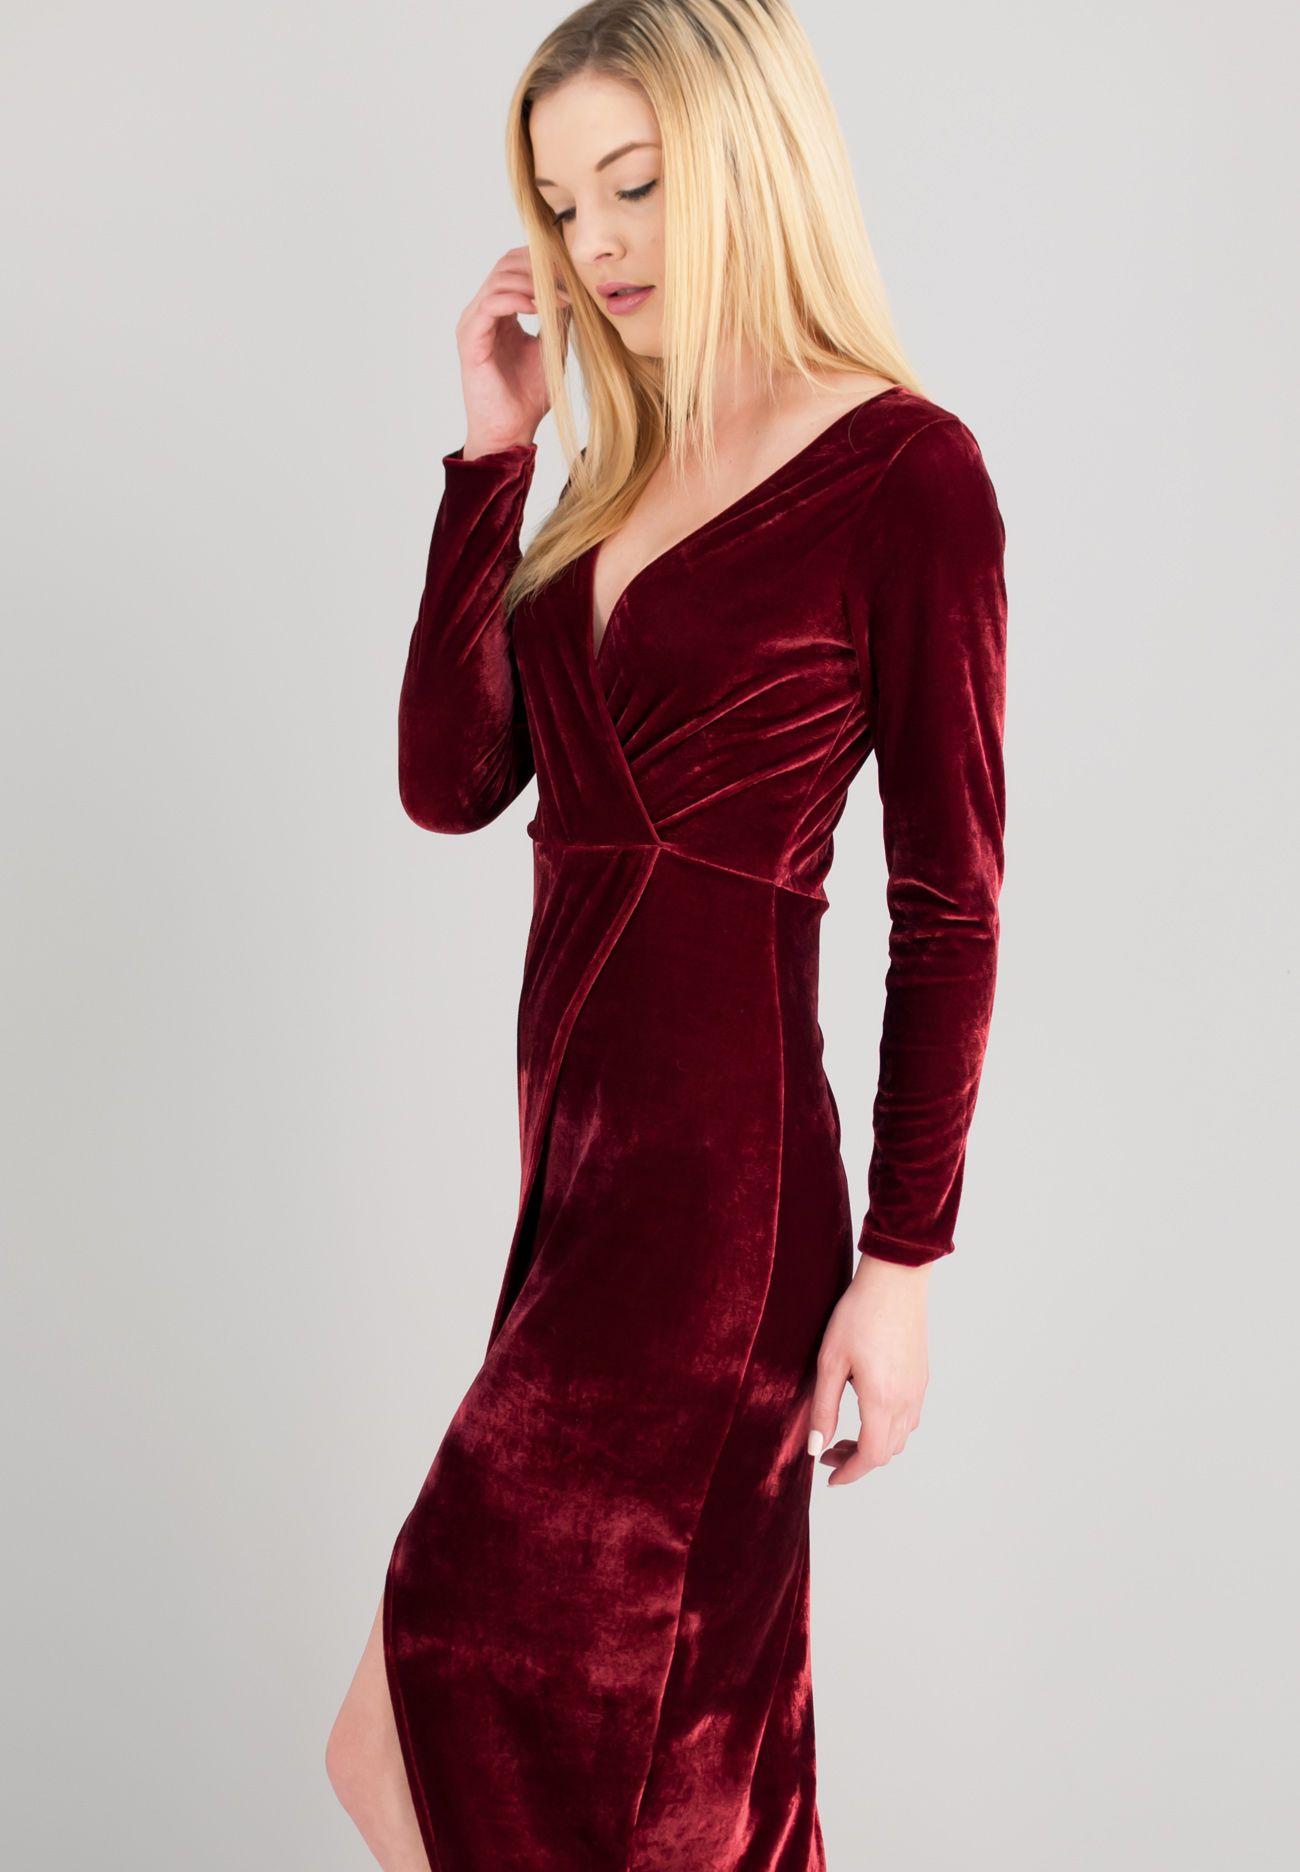 fd625005d03e Maxi κρουαζέ βελούδινο φόρεμα με σκίσιμο μπροστά.